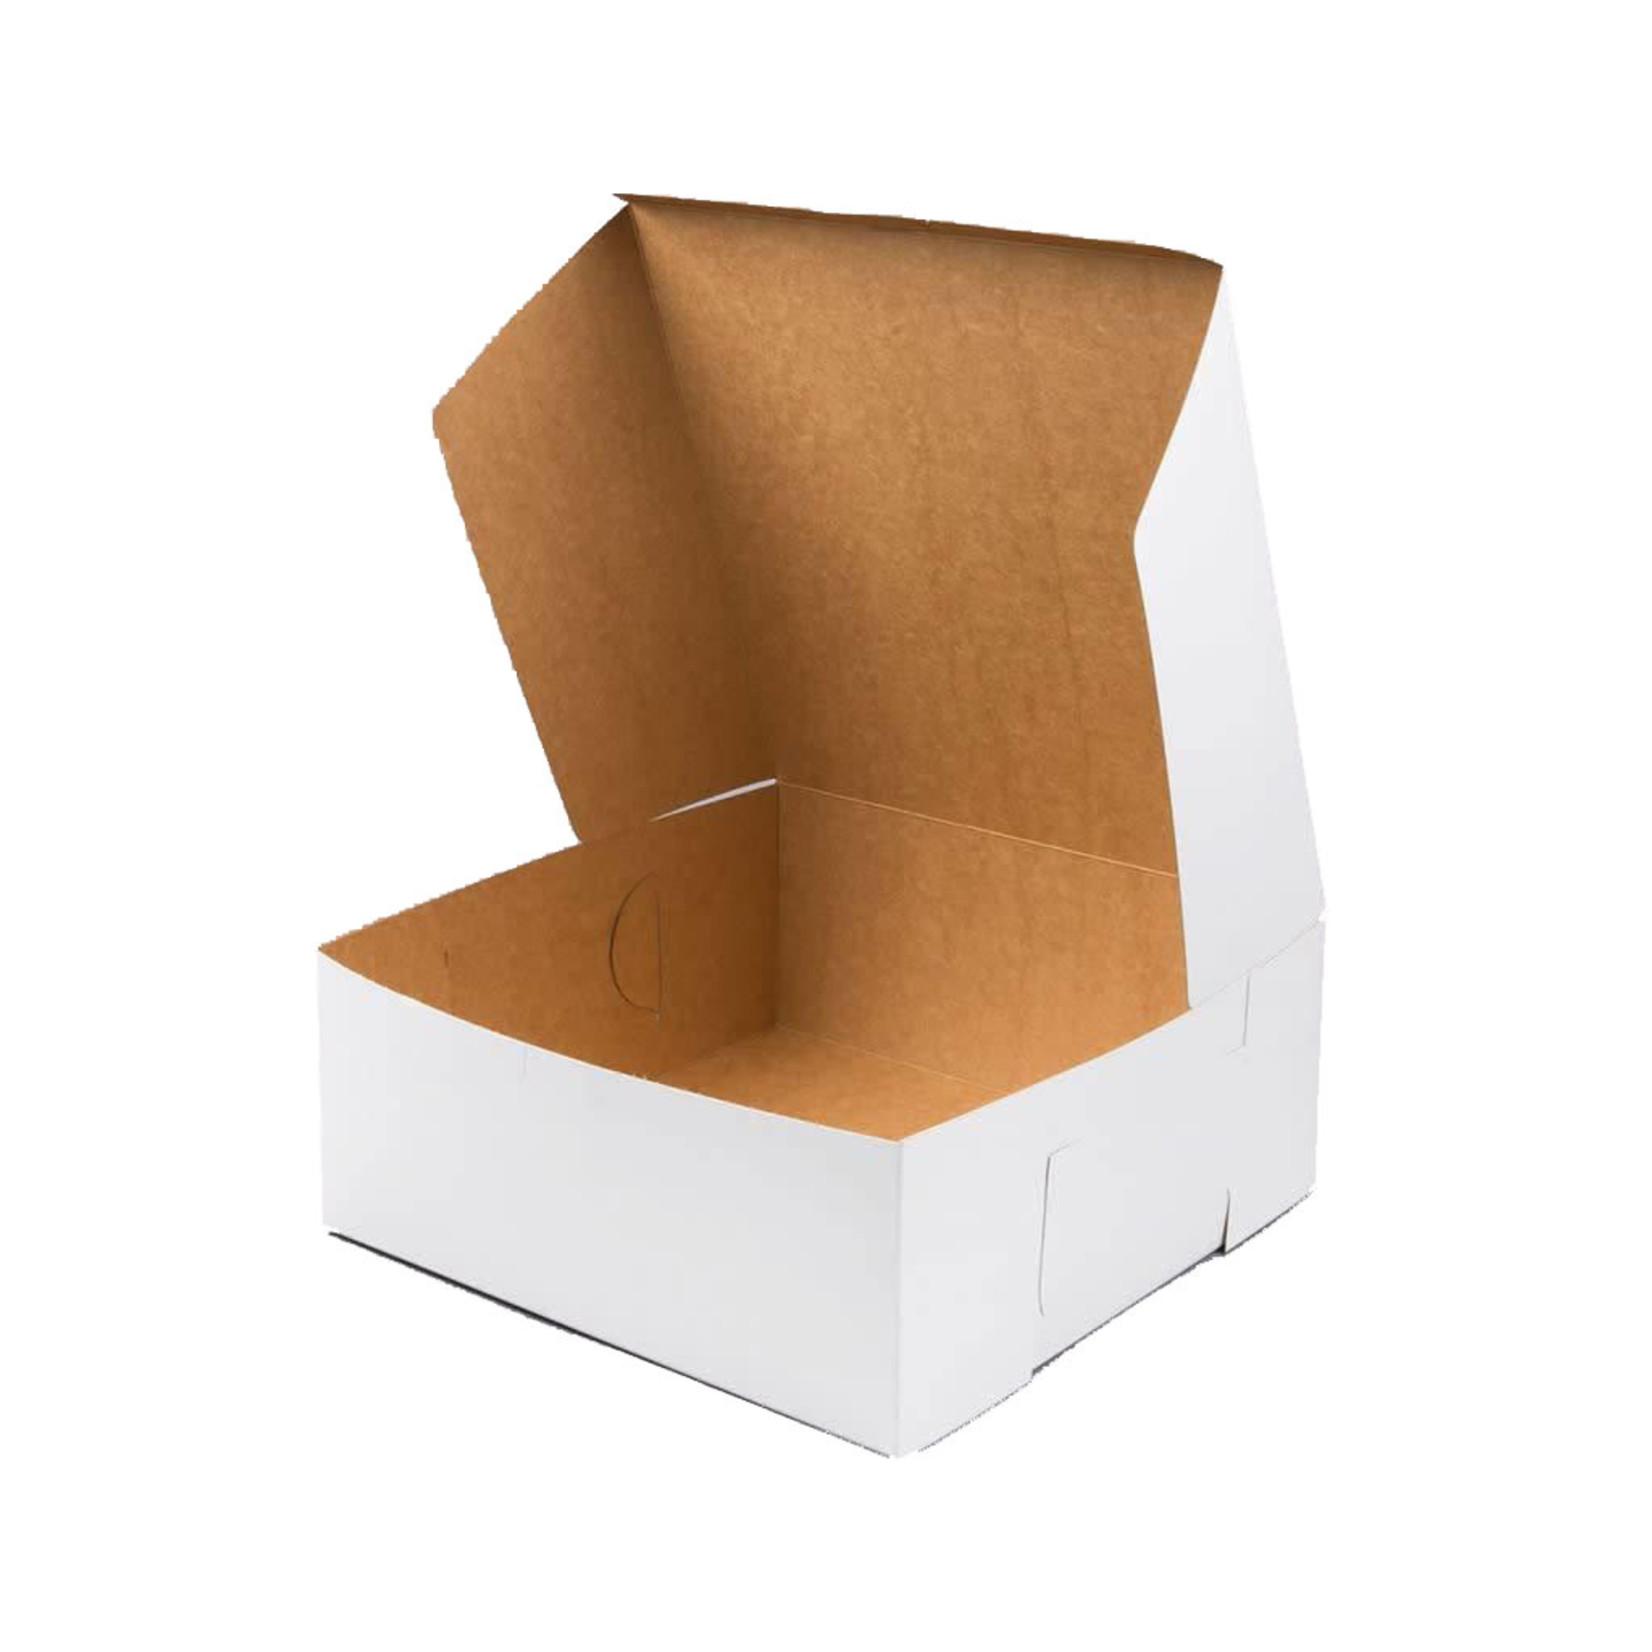 Southern Champion Tray Cake box - white -